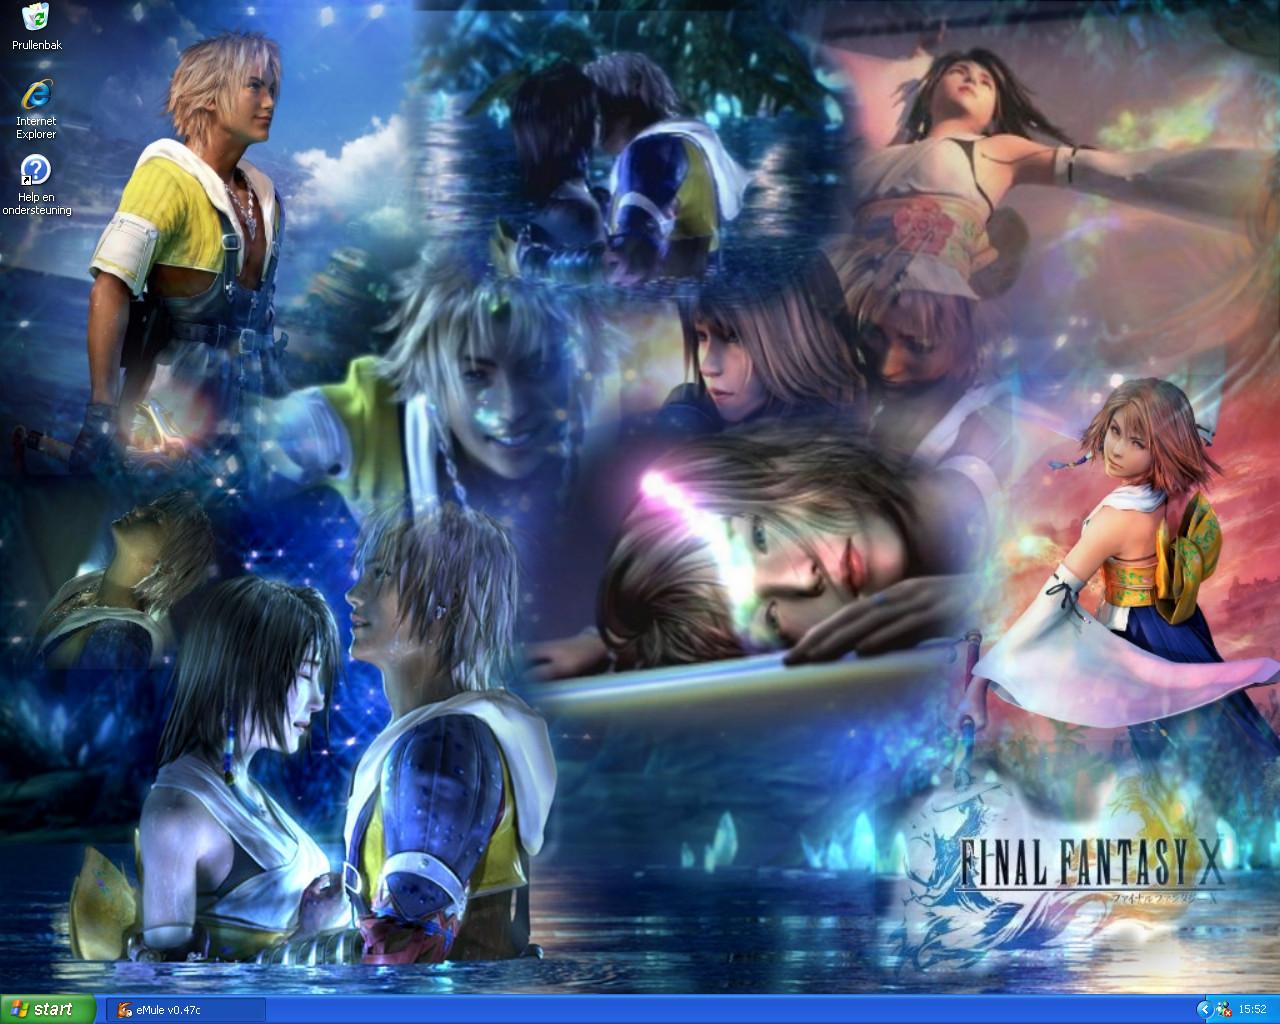 final fantasy wallpaper Final Fantasy Backgrounds 1280x1024